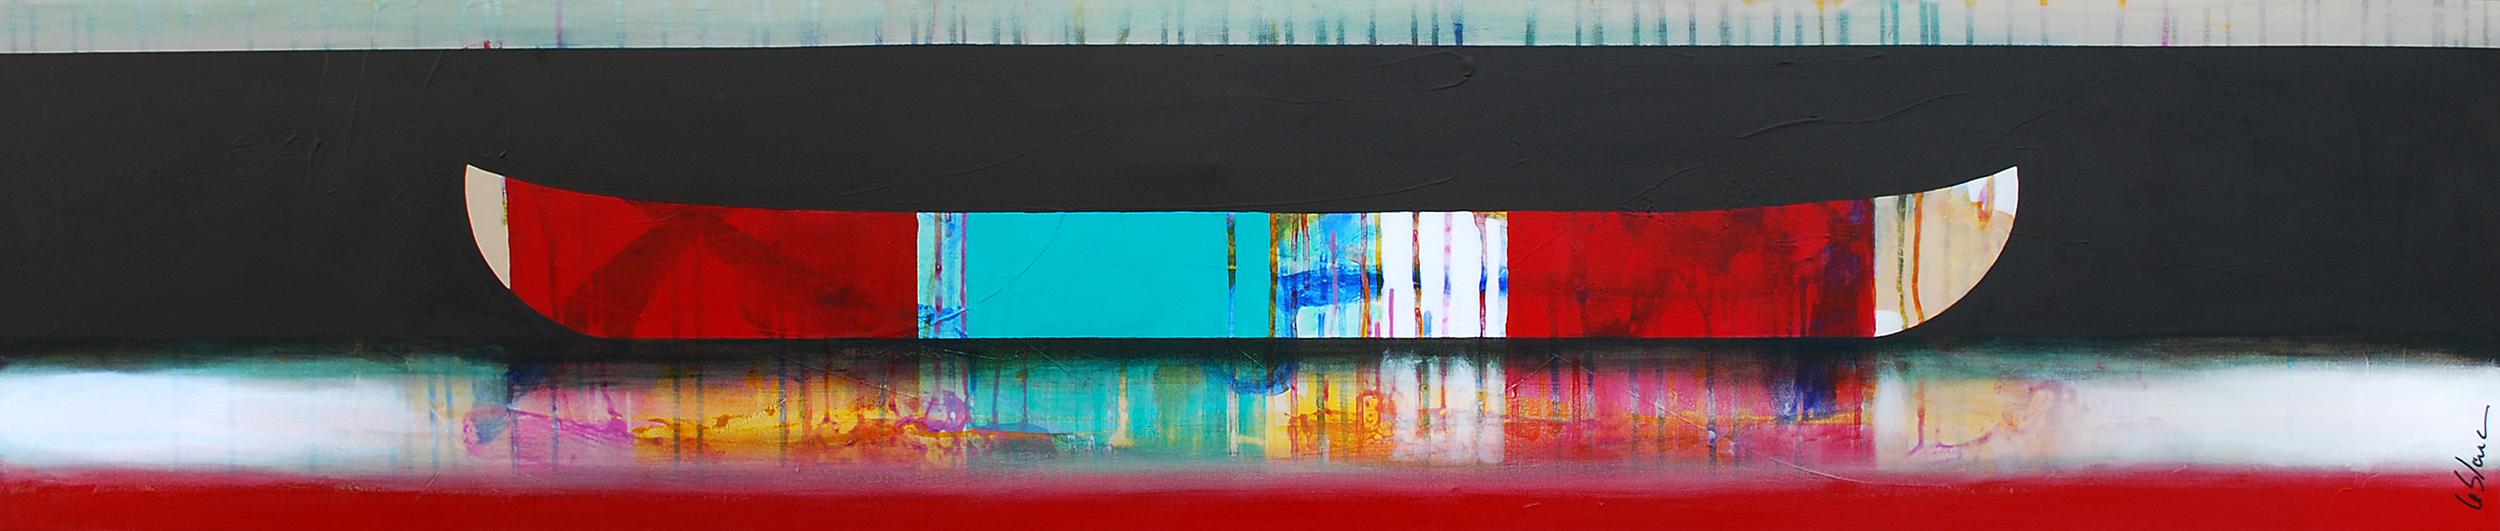 Avec tout dignité, mixed media canoe painting by Sylvain Leblanc | Effusion Art Gallery + Cast Glass Studio, Invermere BC